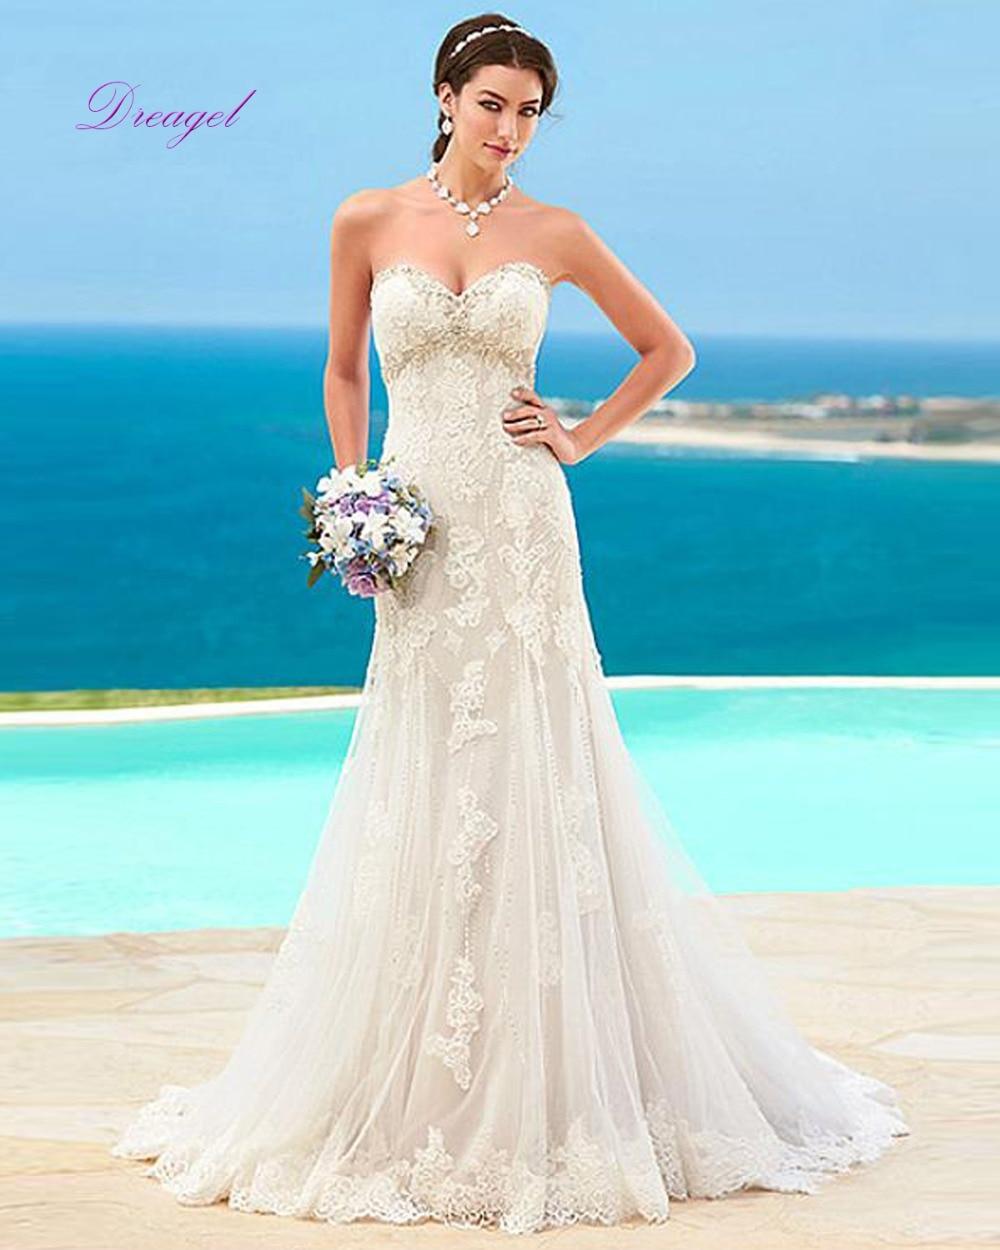 Fine Vestidos De Novia Playa Collection - All Wedding Dresses ...